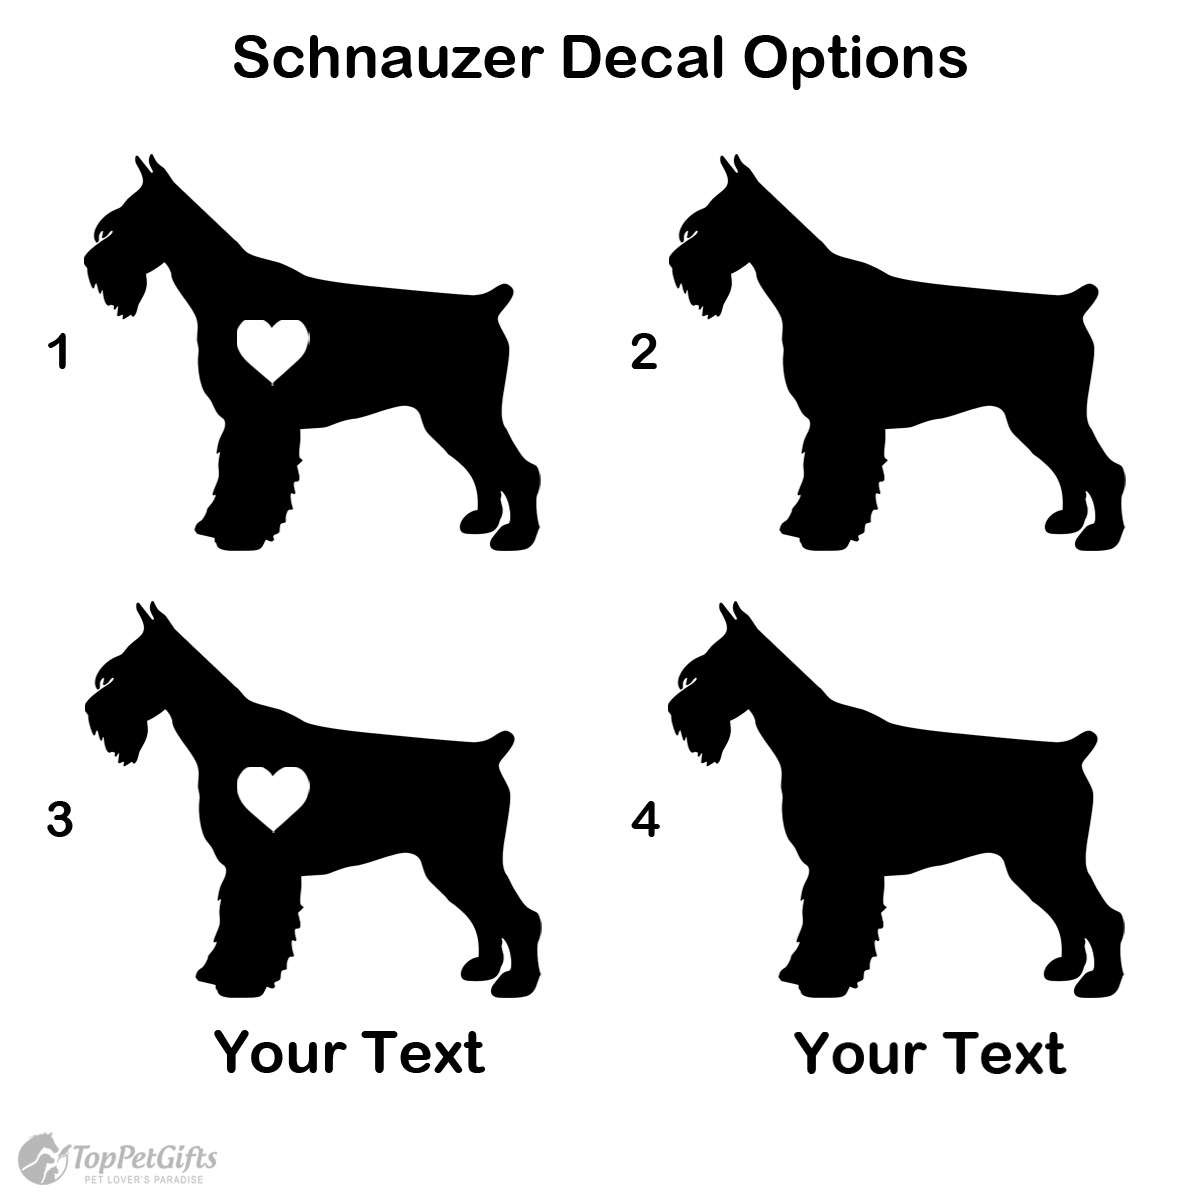 Personalized Schnauzer Decal